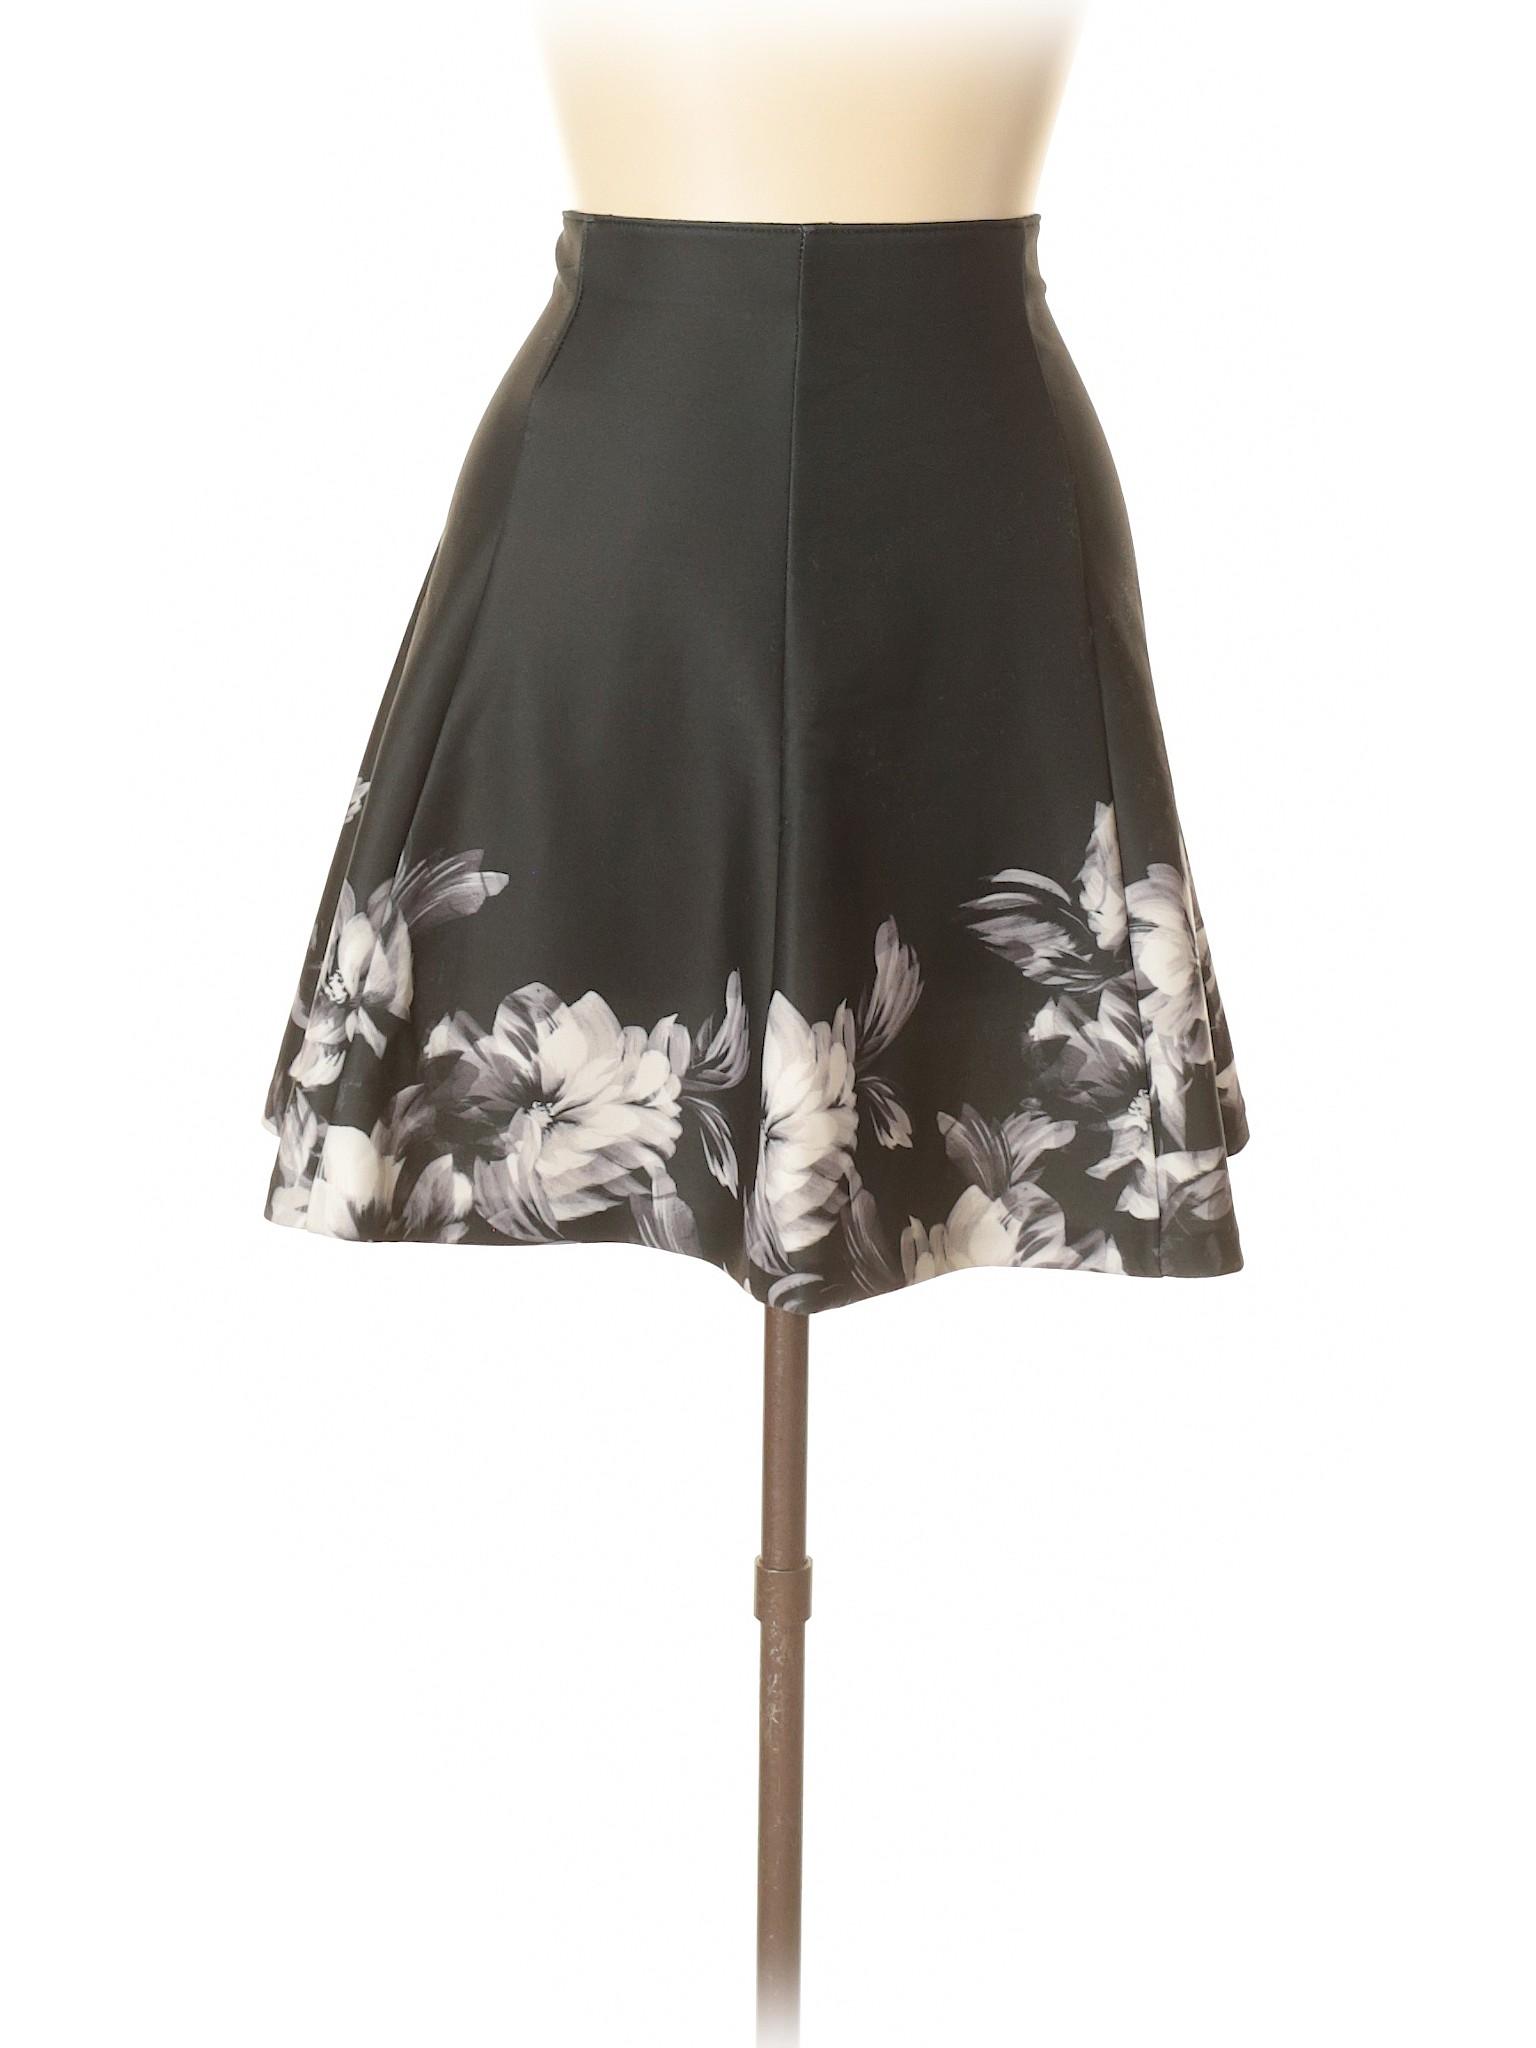 Skirt Apt Casual Leisure 9 winter qXCwnfI